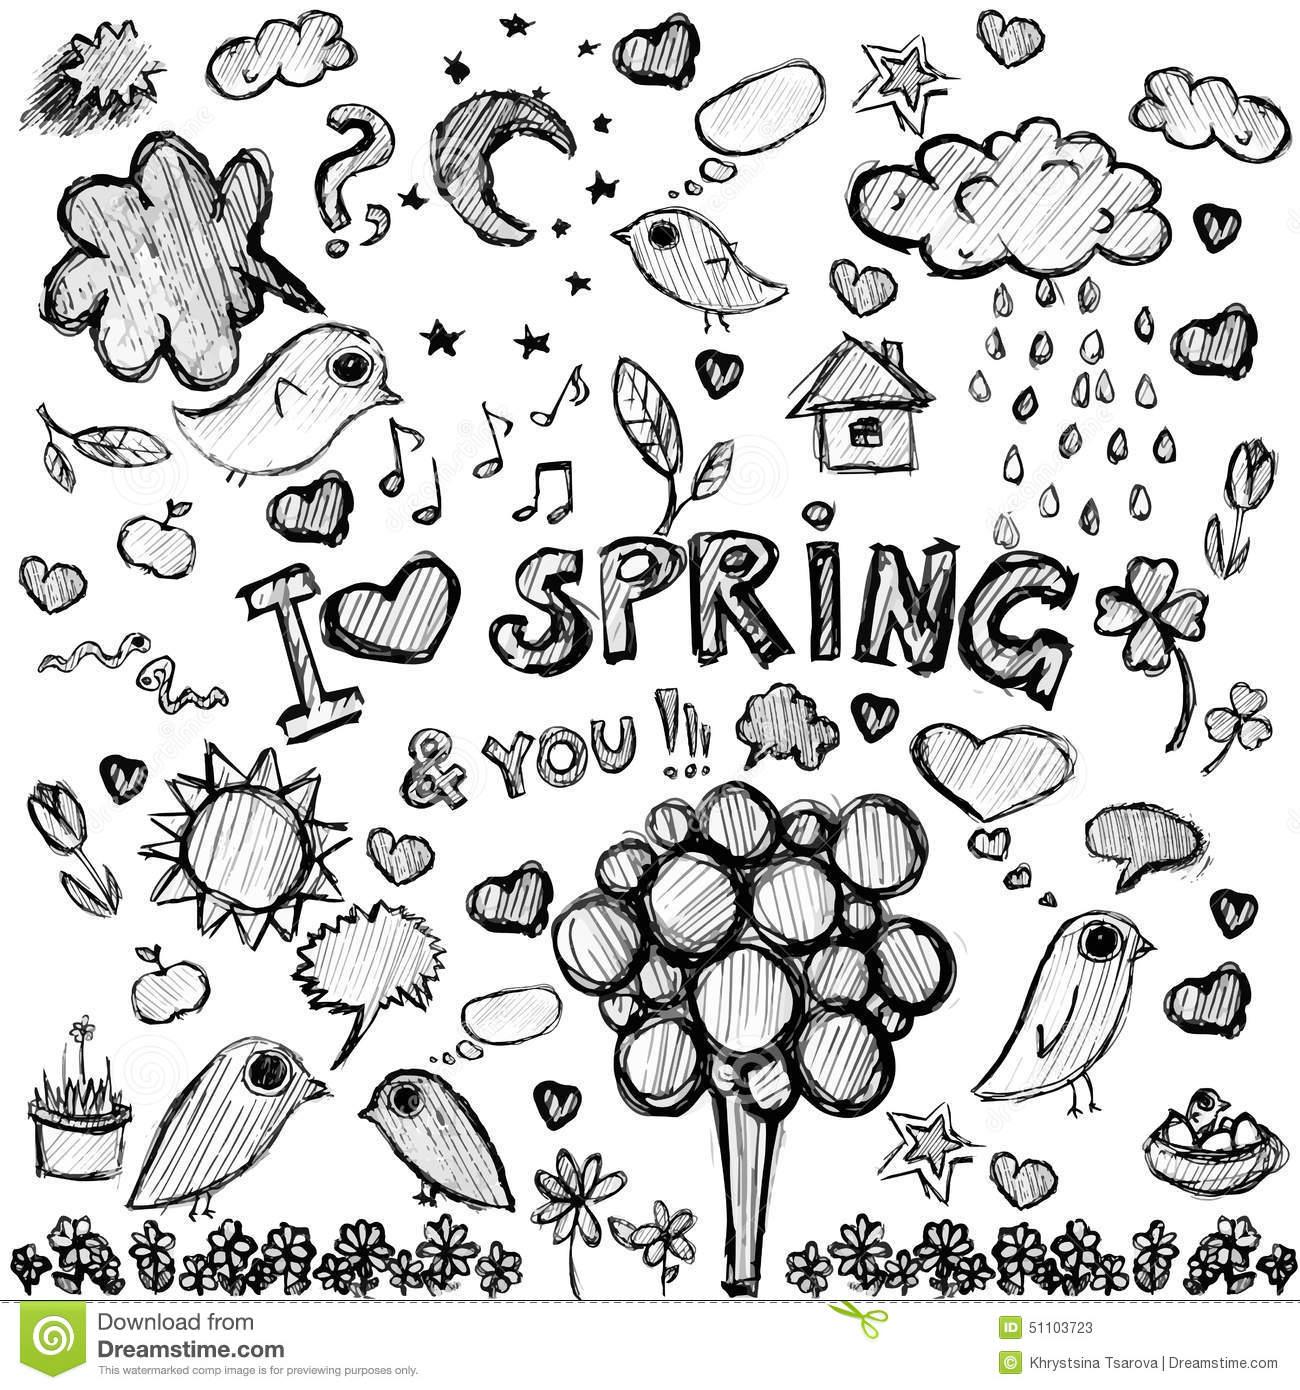 2 clipart spring. Season black and white